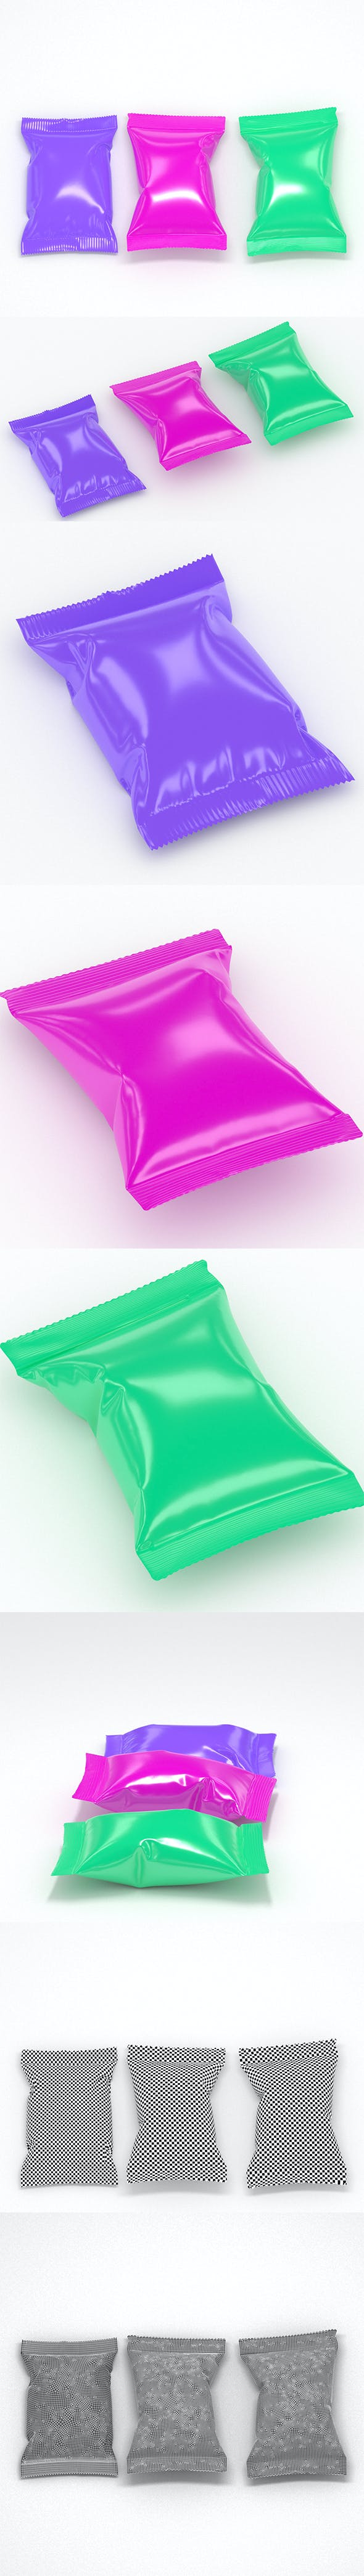 Collection Food packaging v7 - 3DOcean Item for Sale